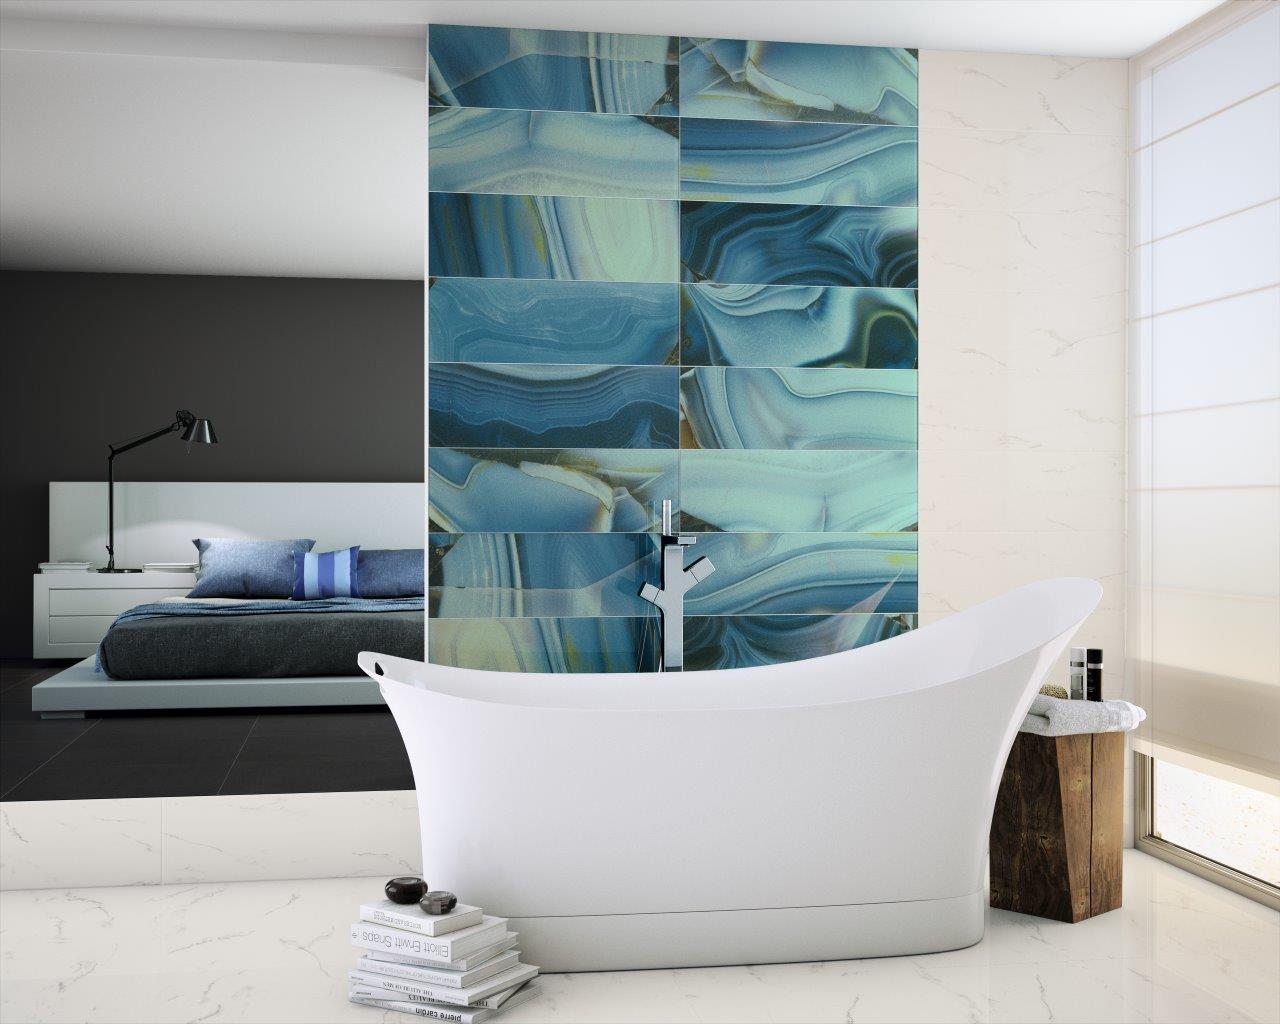 Aurora Glass - Phoenix, AZ Ceramic Tile & Stone Designs | Villagio, LLC